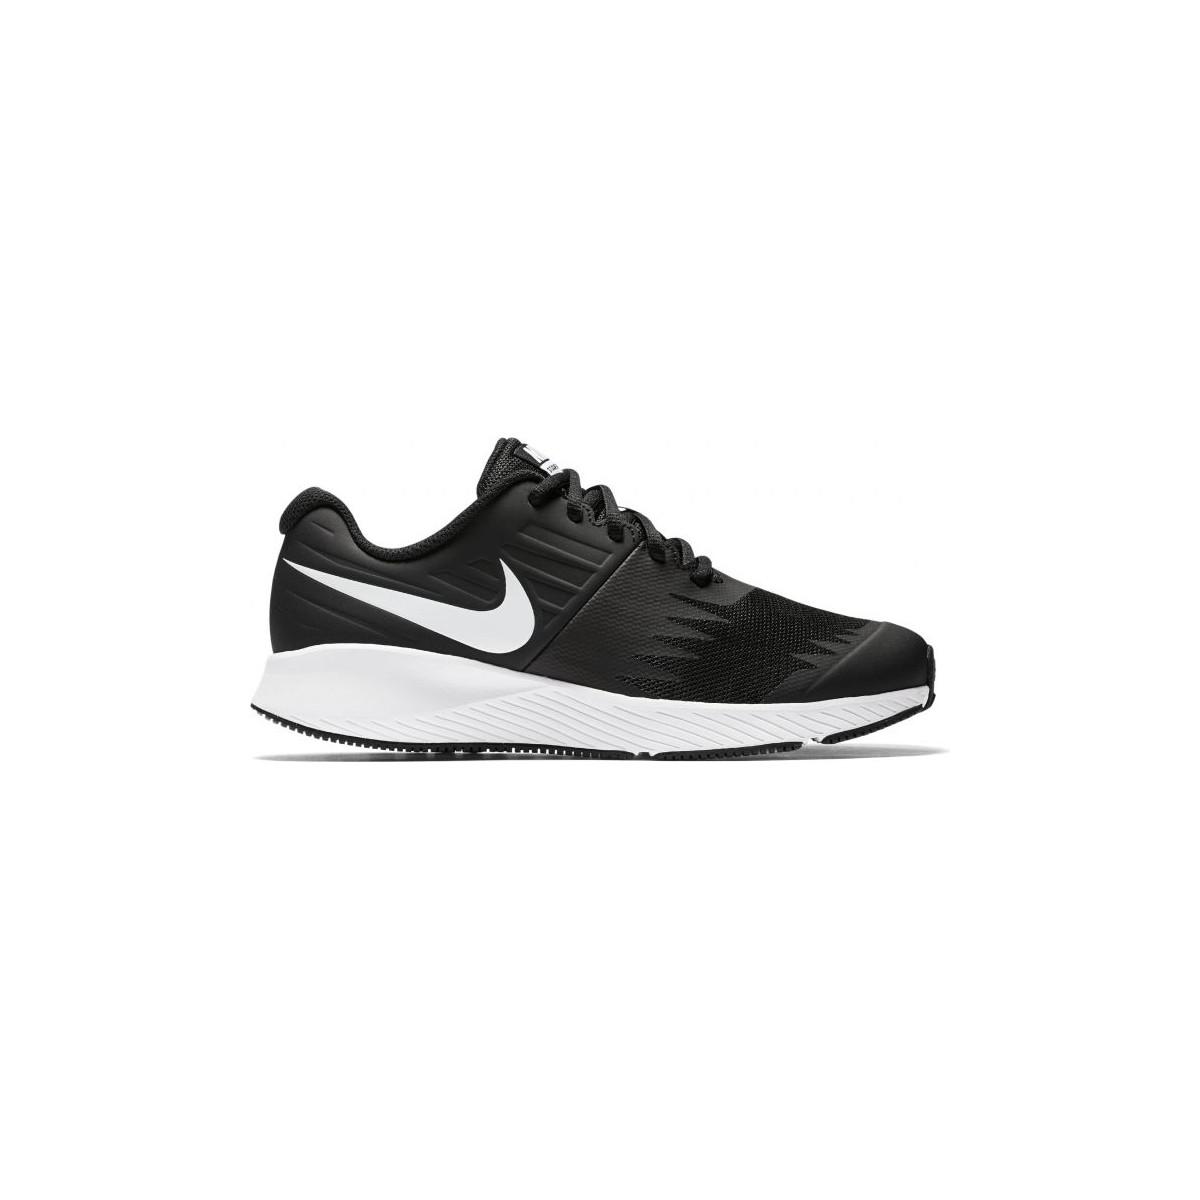 514c40d6e75c8 Nike Star Runner  Zapatillas Mujer Star Runner GS  Comprar Nike ...